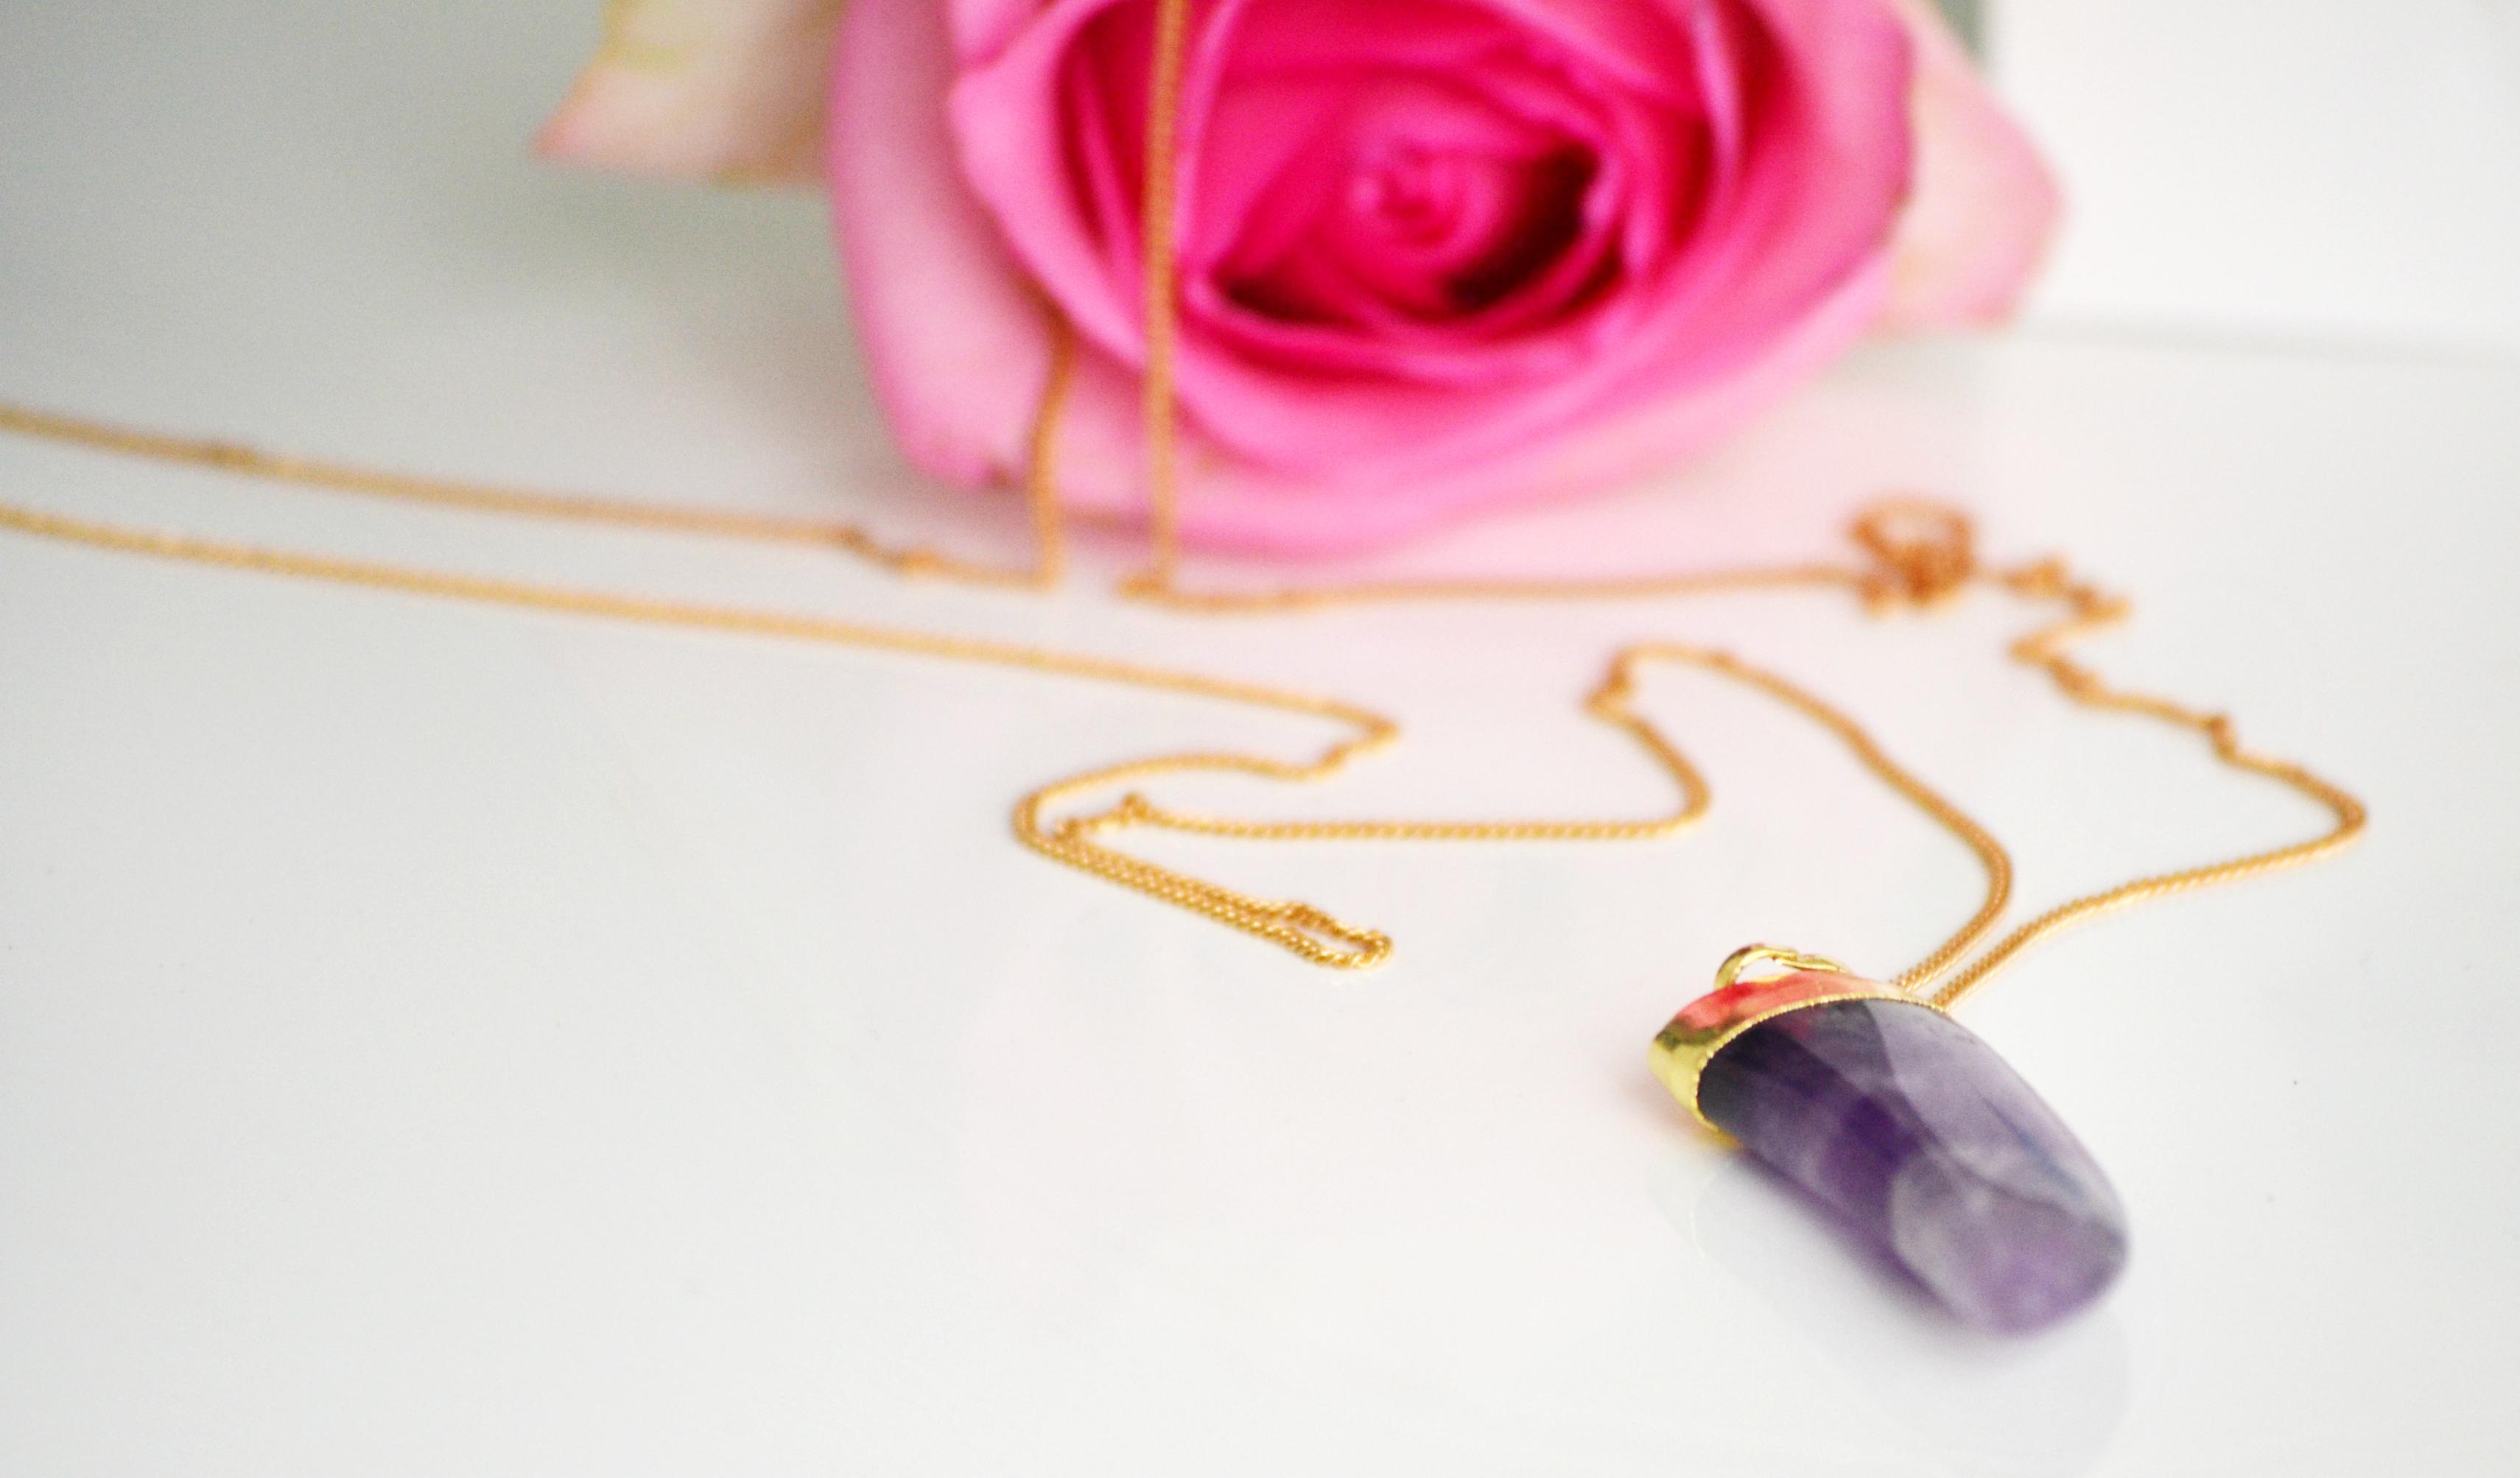 gem-tooth-necklace